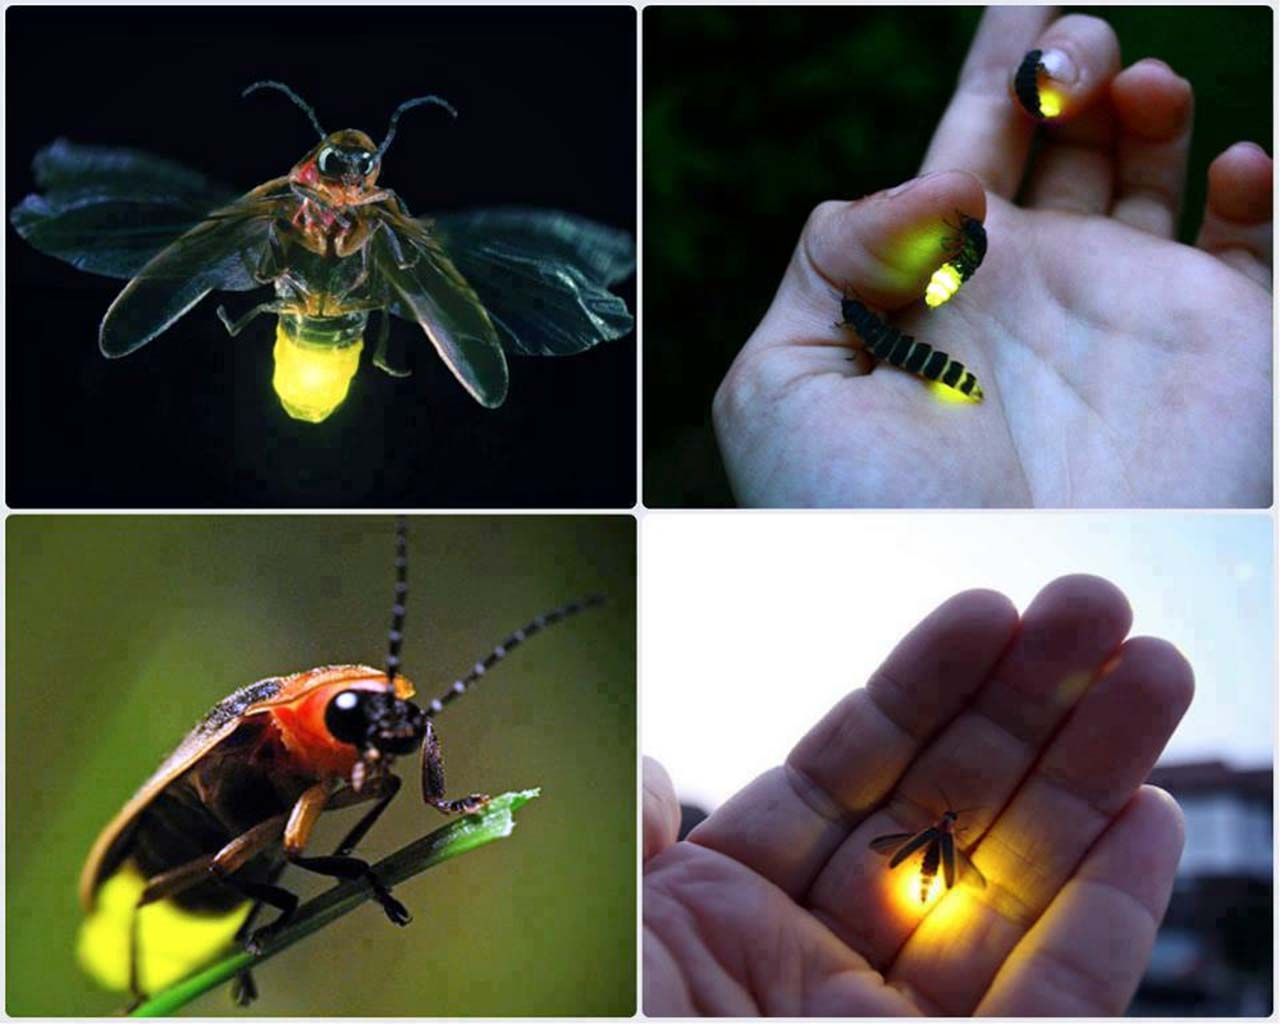 Lightening Bug Fire Fly Firefly